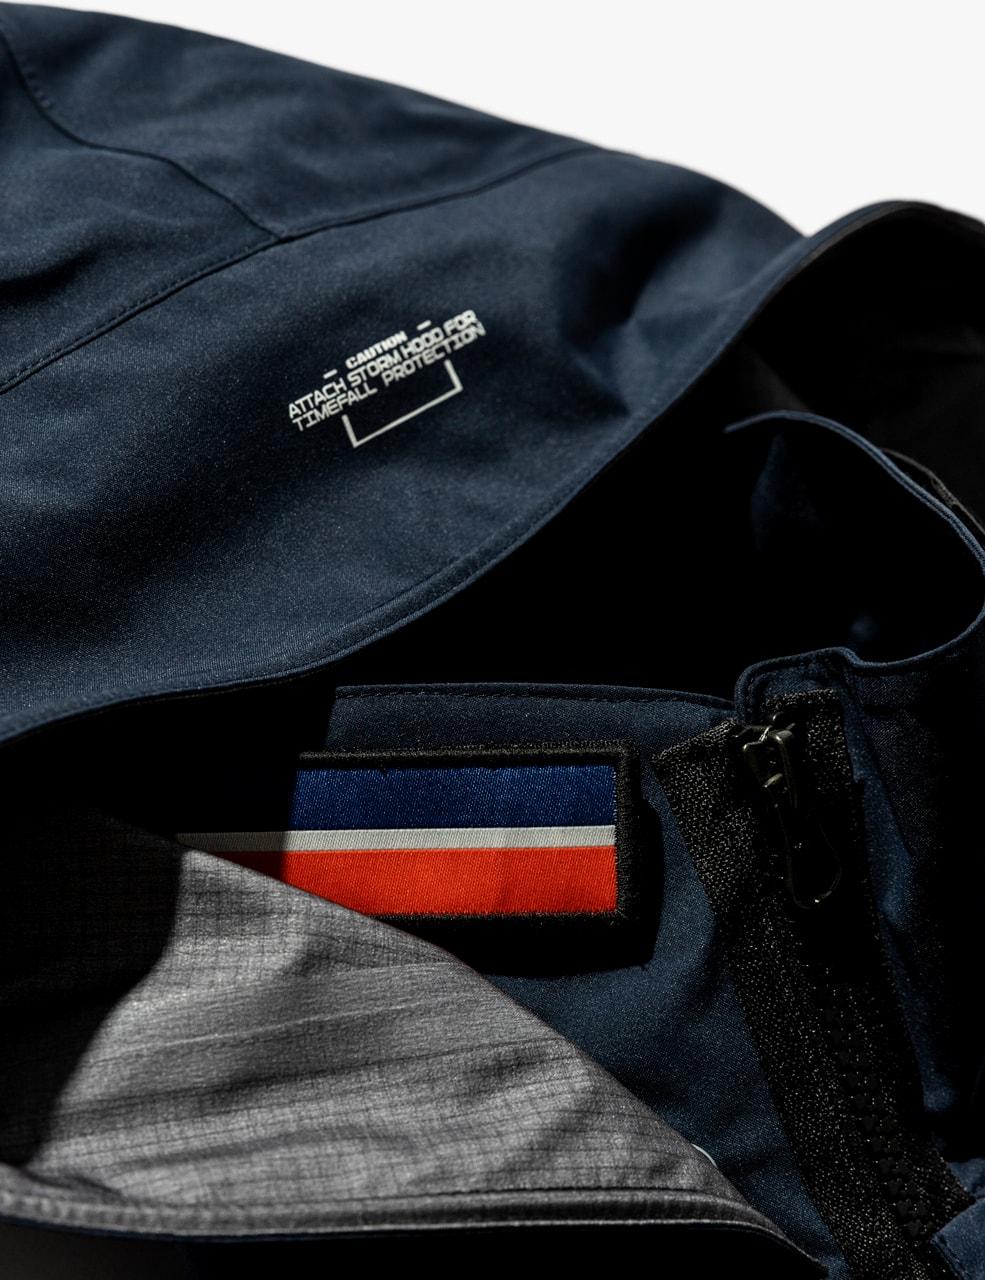 Errolson Hugh ACRONYM, Nothing Knew HBX Giveaway Tom Sachs x Nike Mars Yard Overshoe friends family f&f vapormax silver colorway Z1-J1A J1E-GT J1A-GTKP